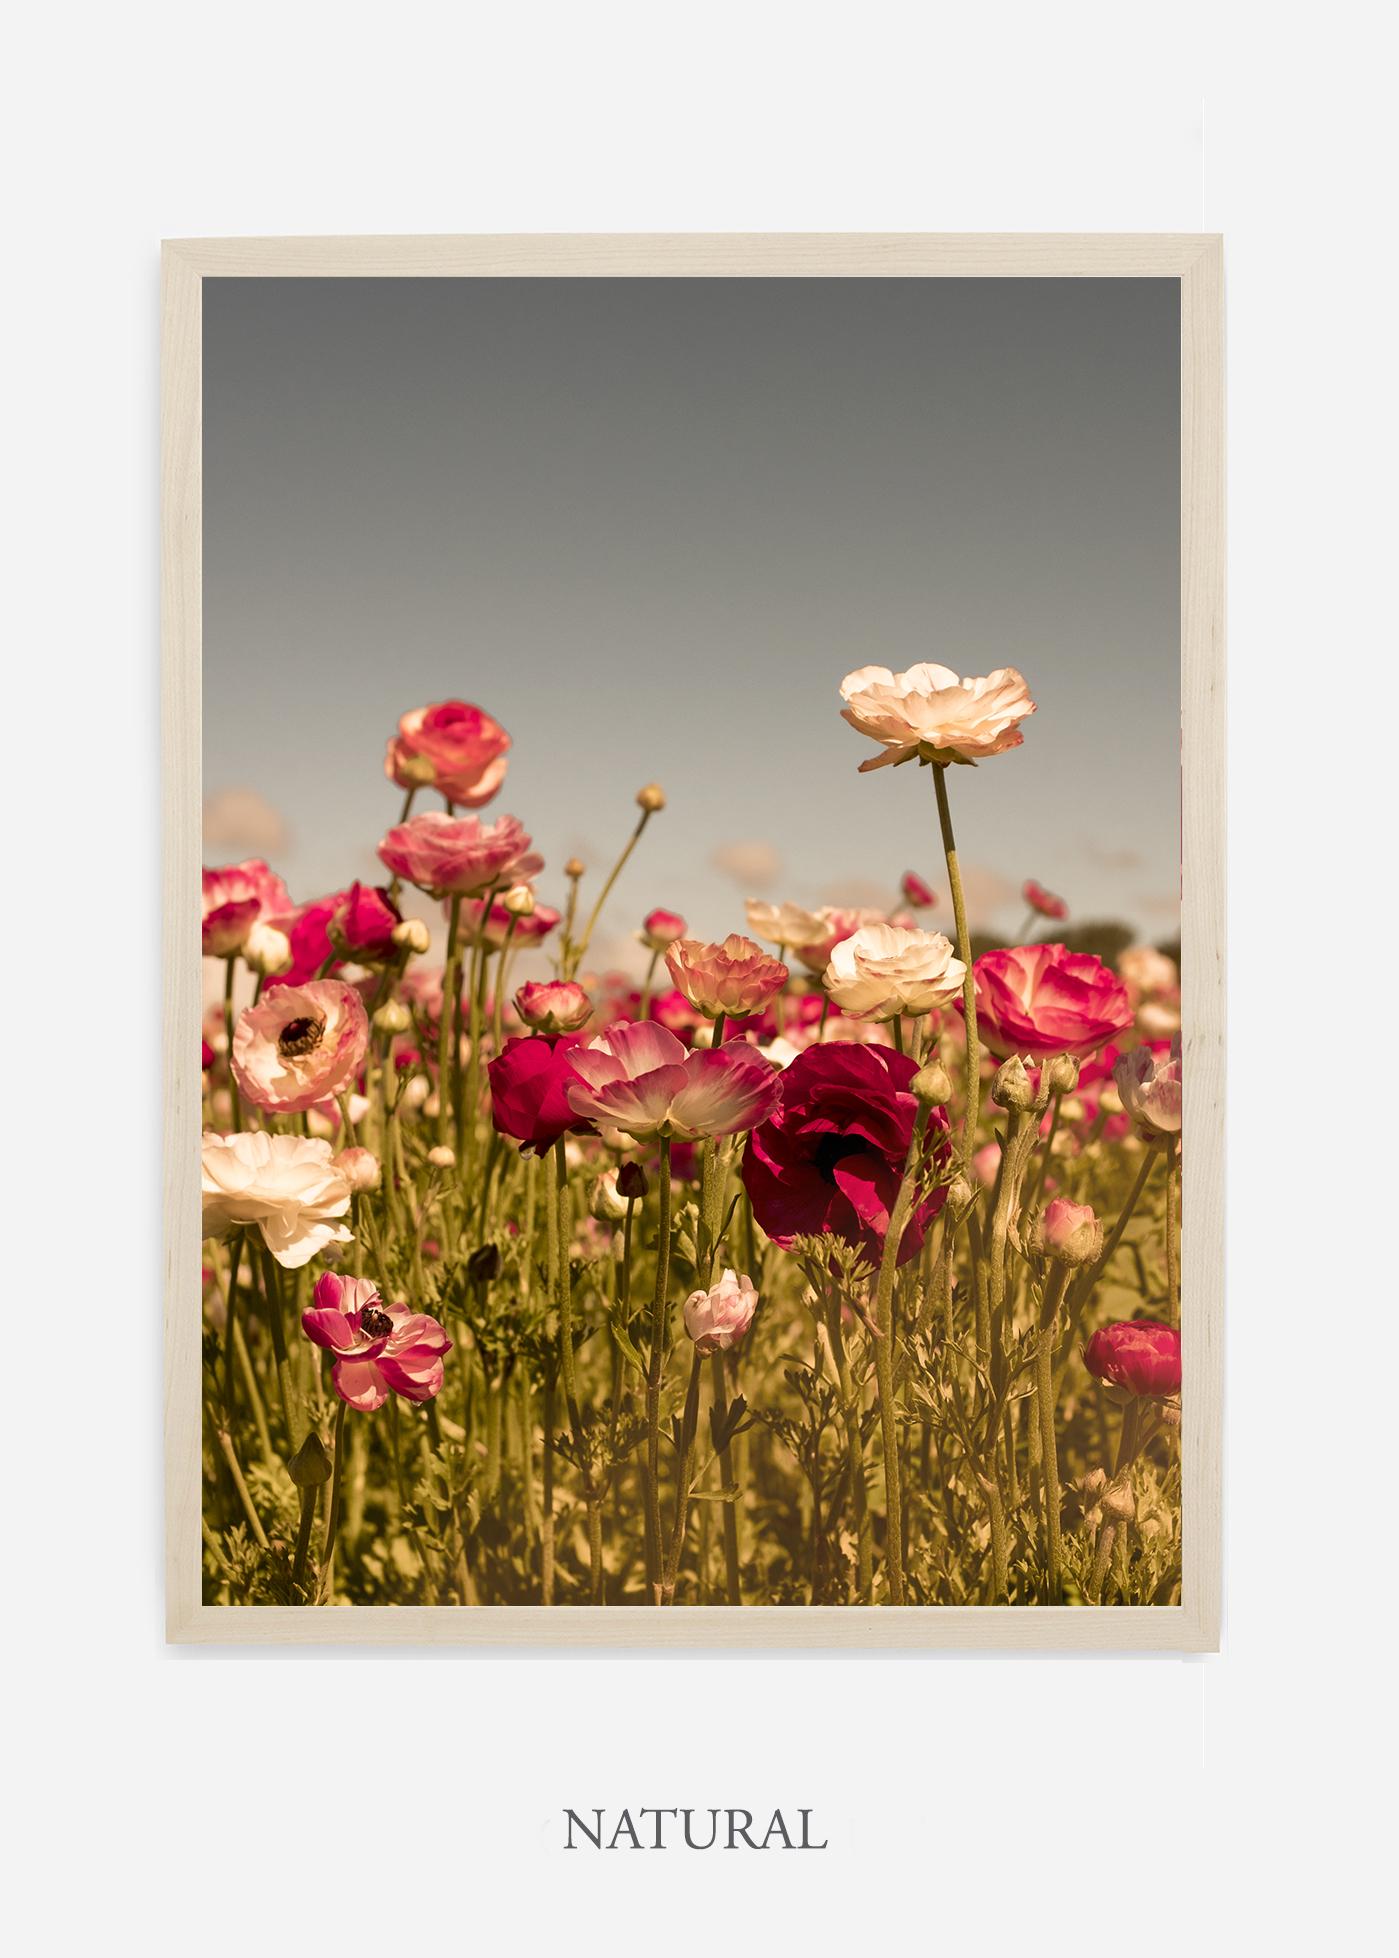 wilder-california-Floral-No.3-natural-frame-no-mat-interior-design-botanical-print-art-floral-art.jpg